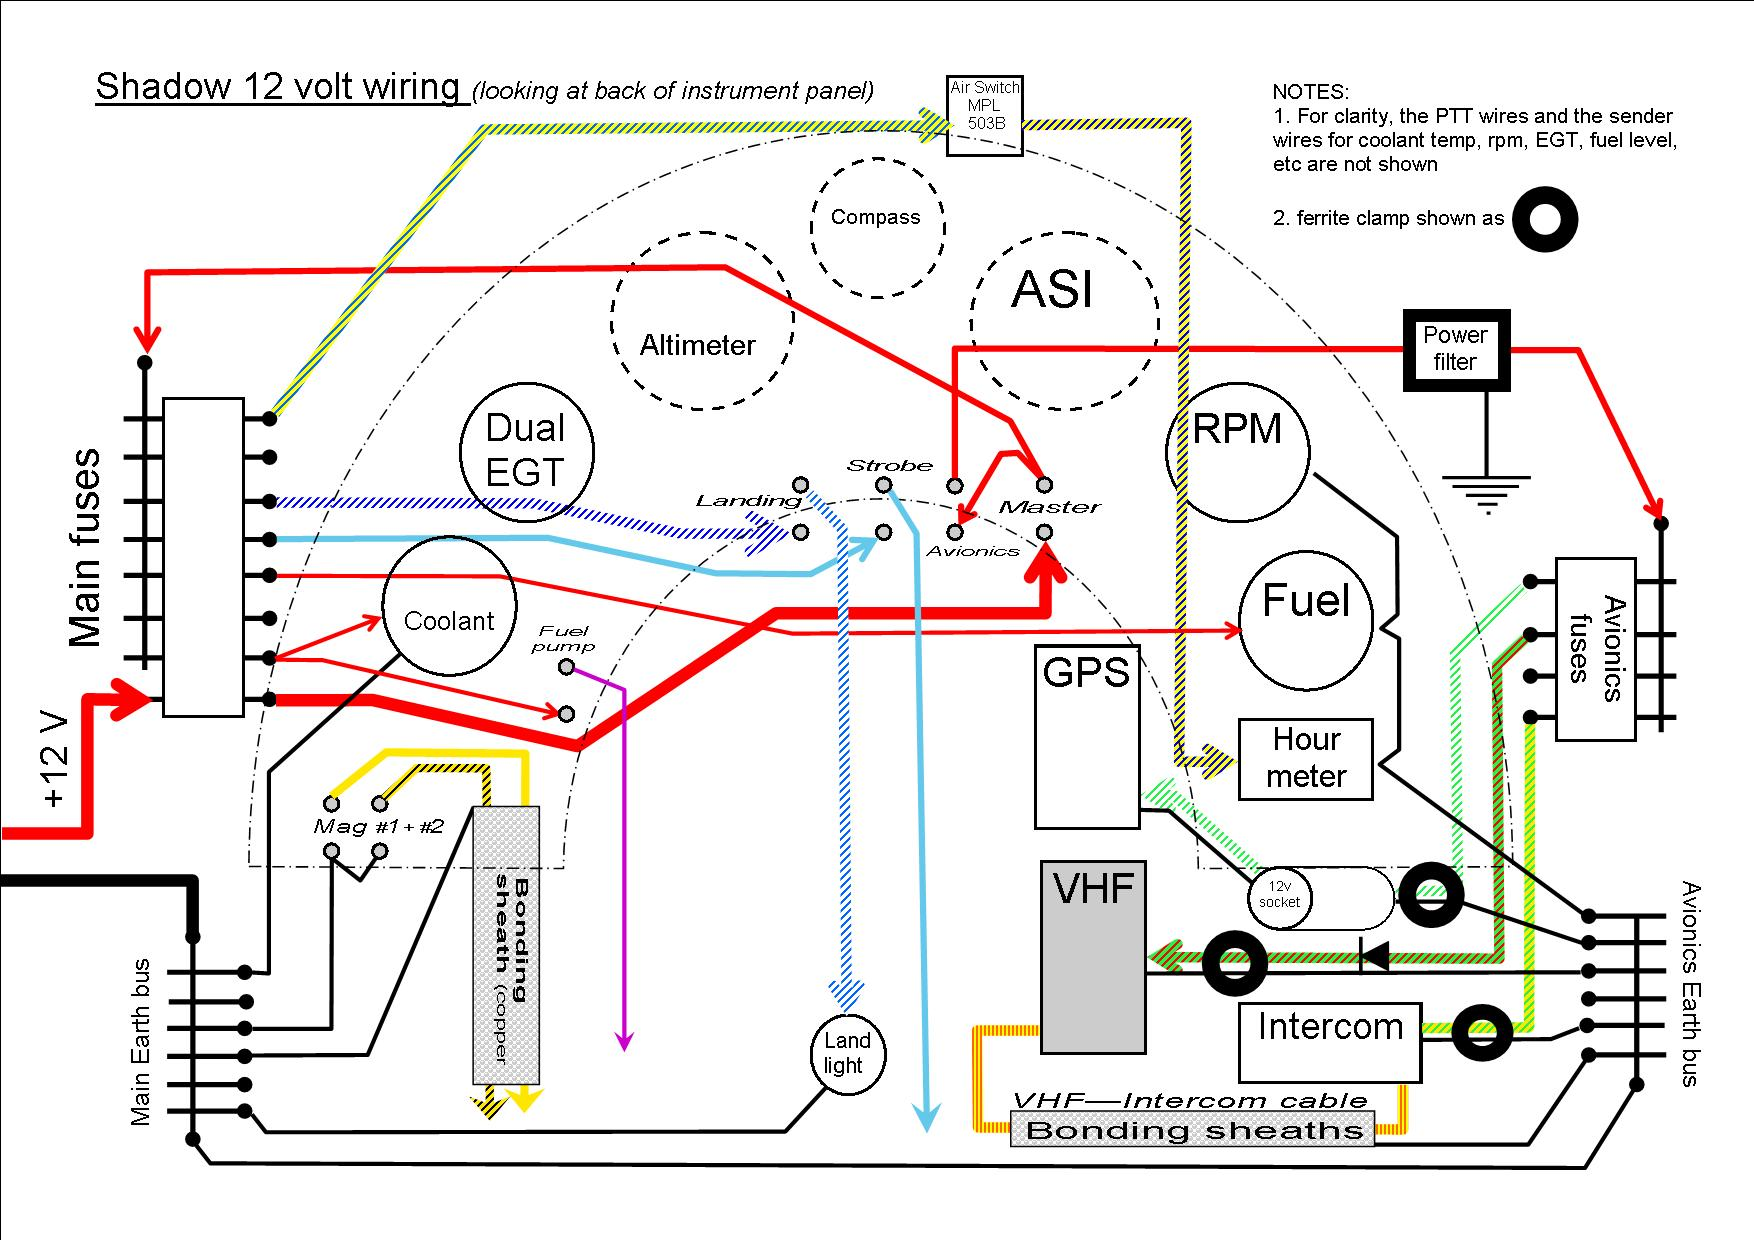 [DIAGRAM_38IU]  Rotax Ignition Points Wiring Diagram Free Download - Wiring Diagrams | Rotax 912 Engine Diagram |  | karox.fr